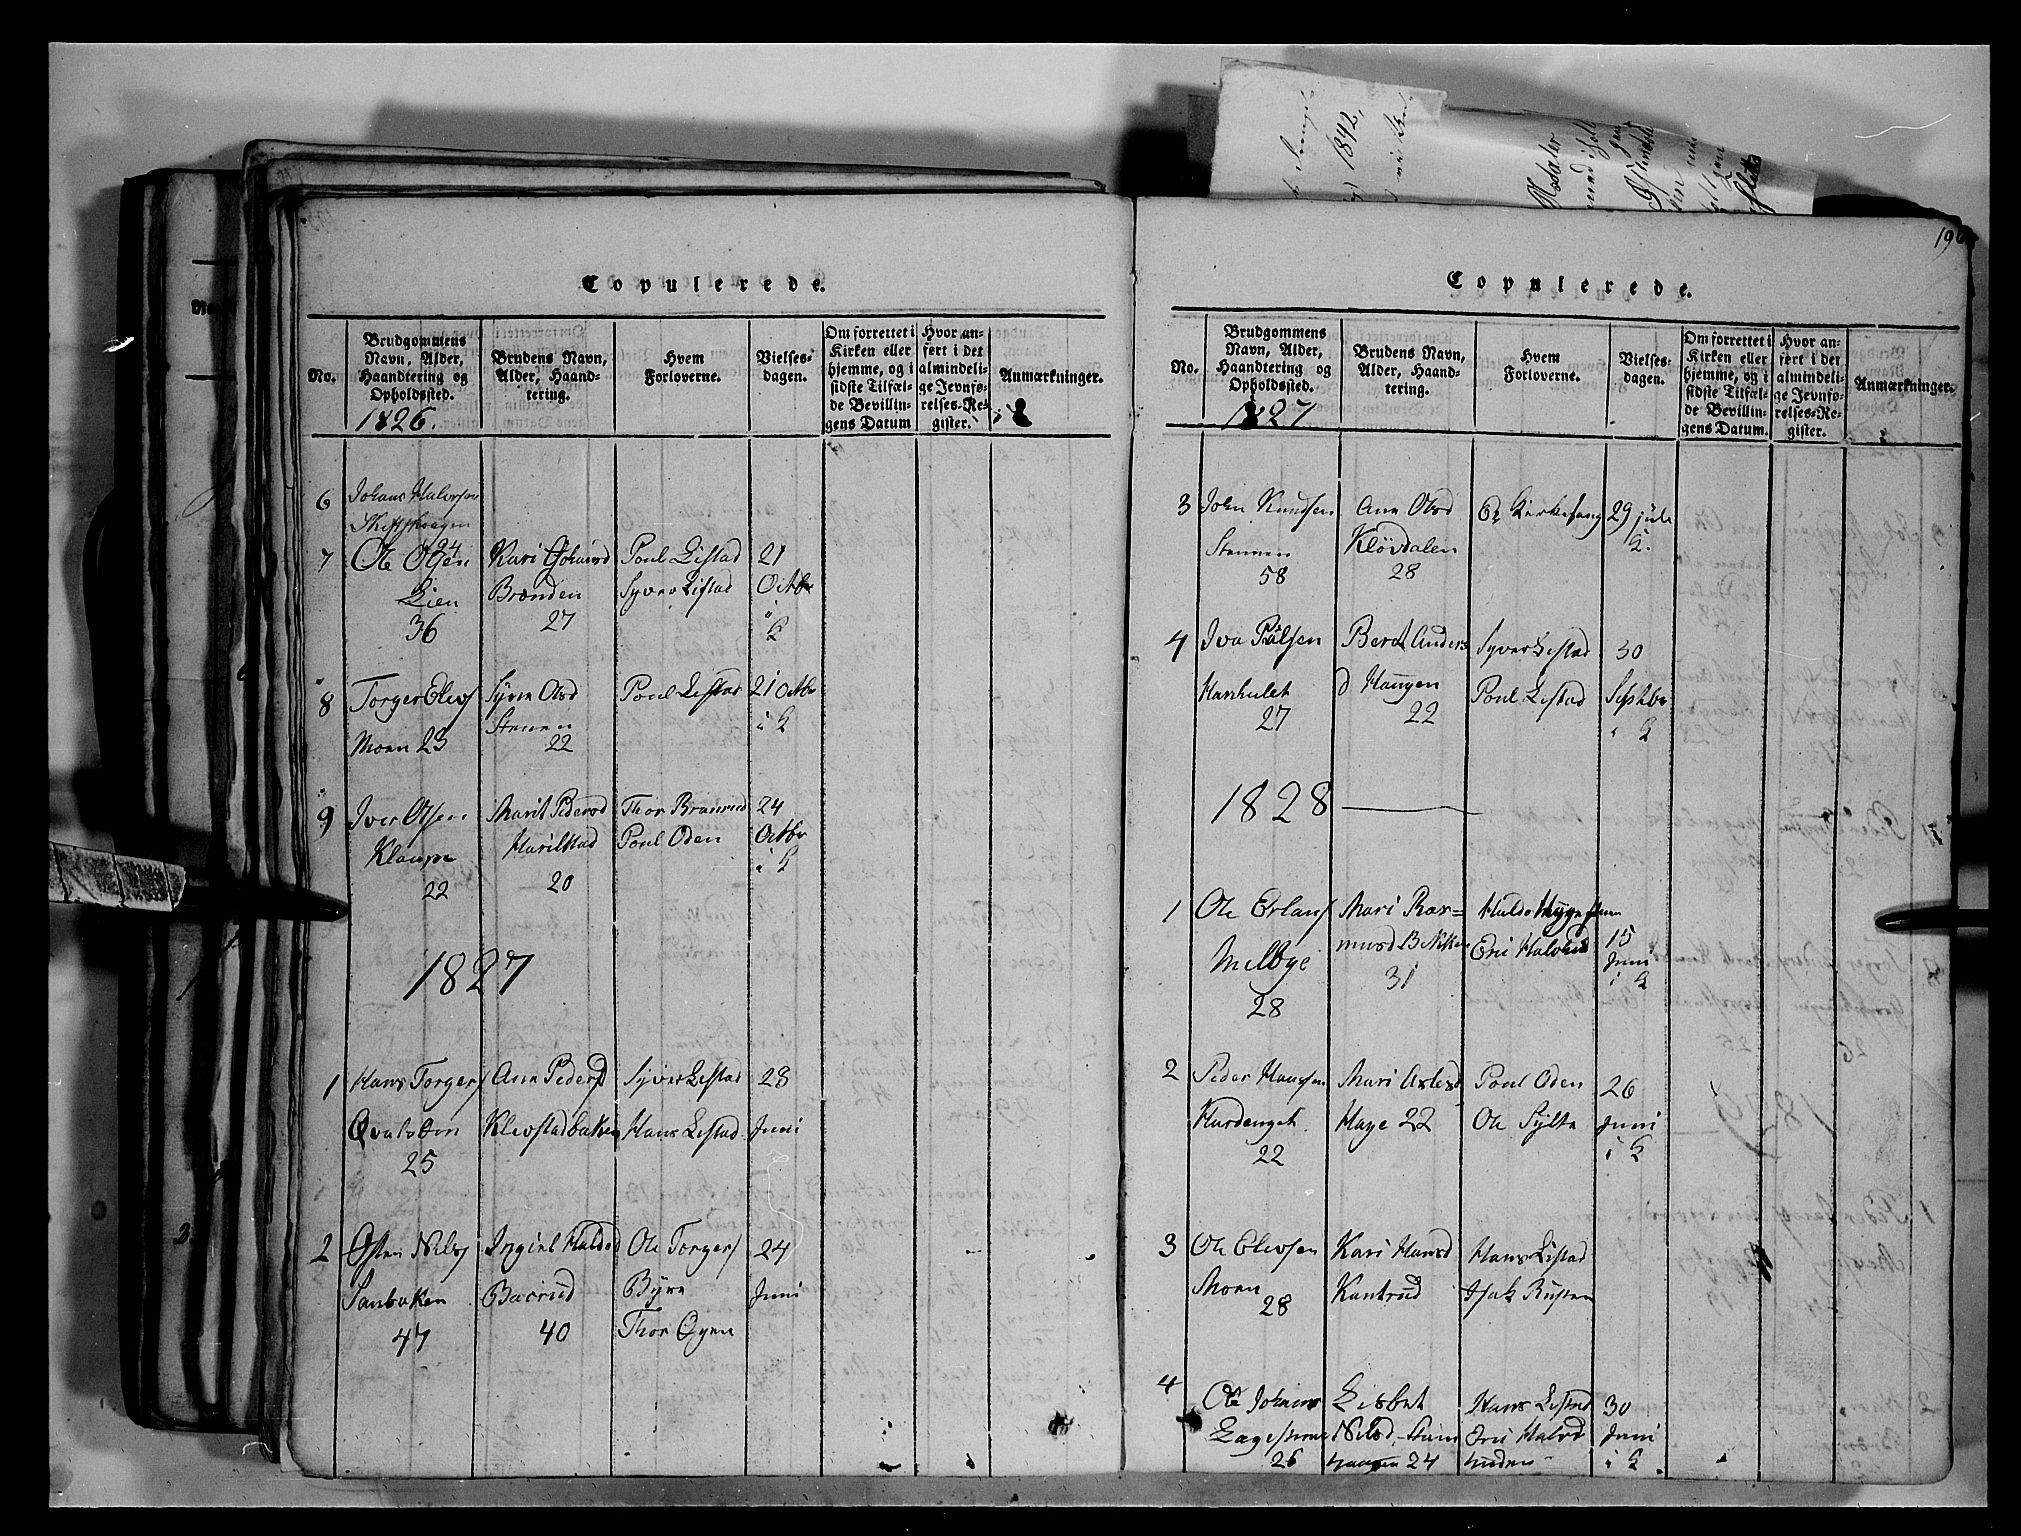 SAH, Fron prestekontor, H/Ha/Hab/L0003: Klokkerbok nr. 3, 1816-1850, s. 196